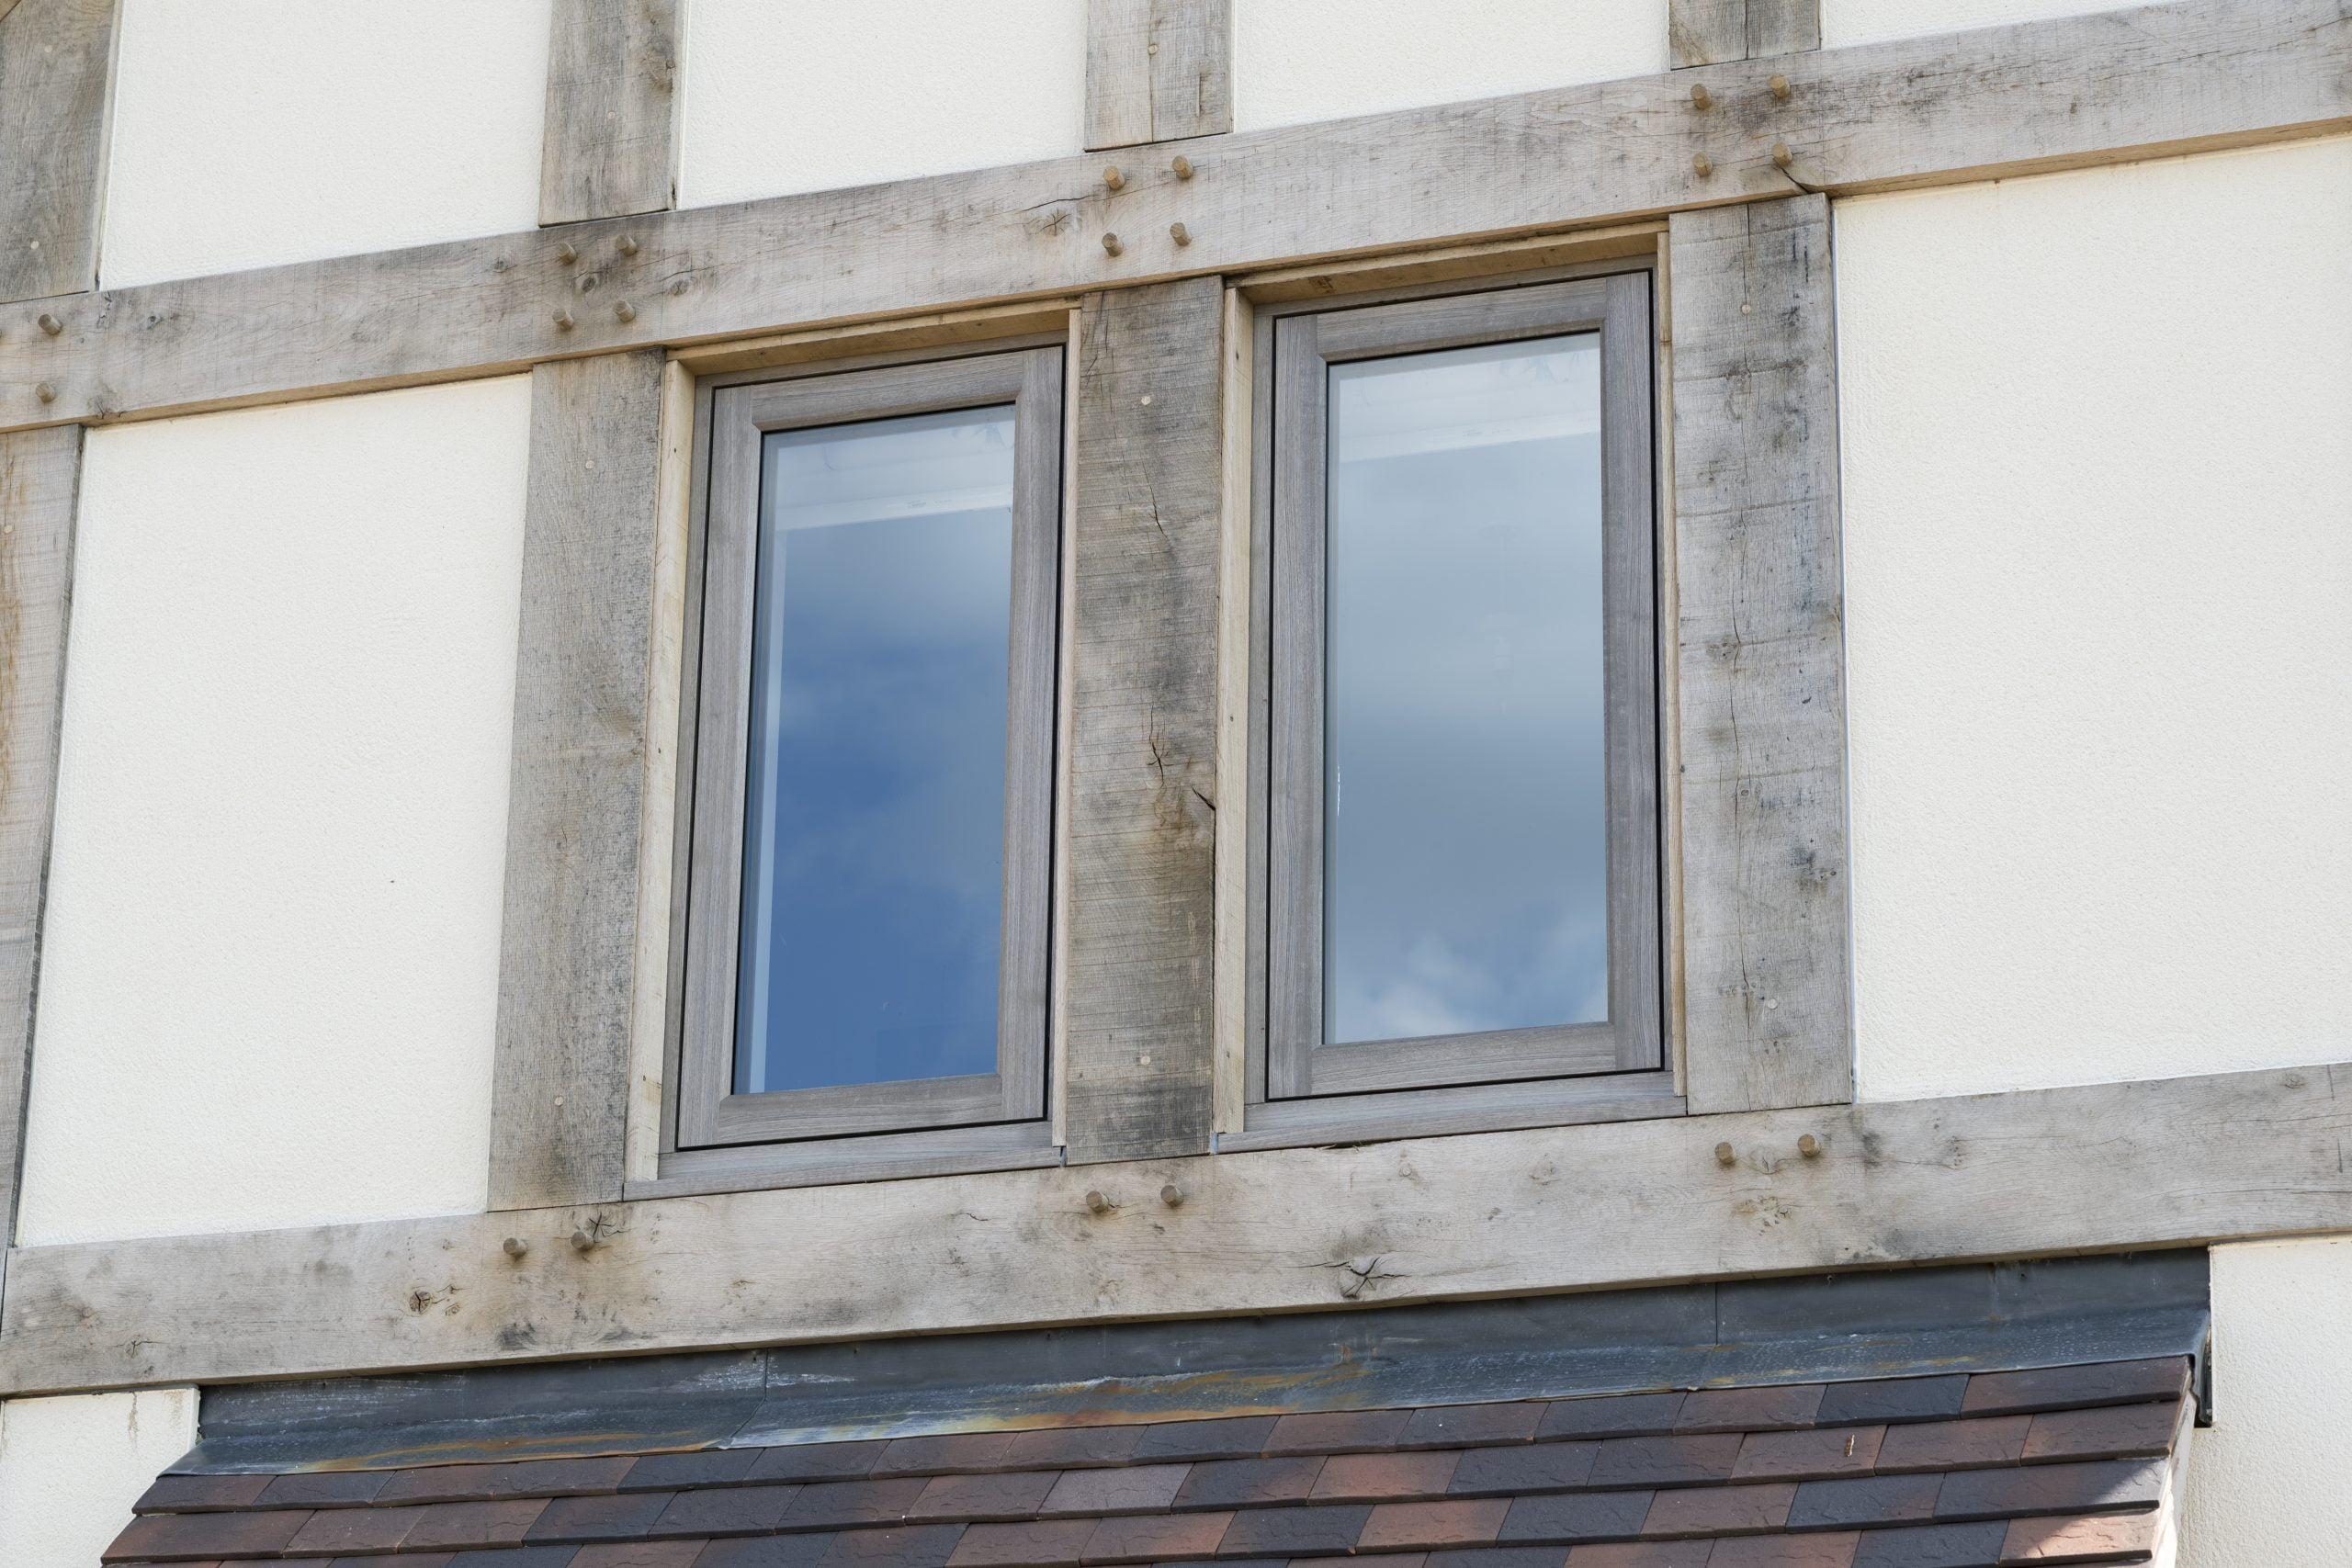 Residence 2 windows in Silvered Oak by Wharfedale Windows